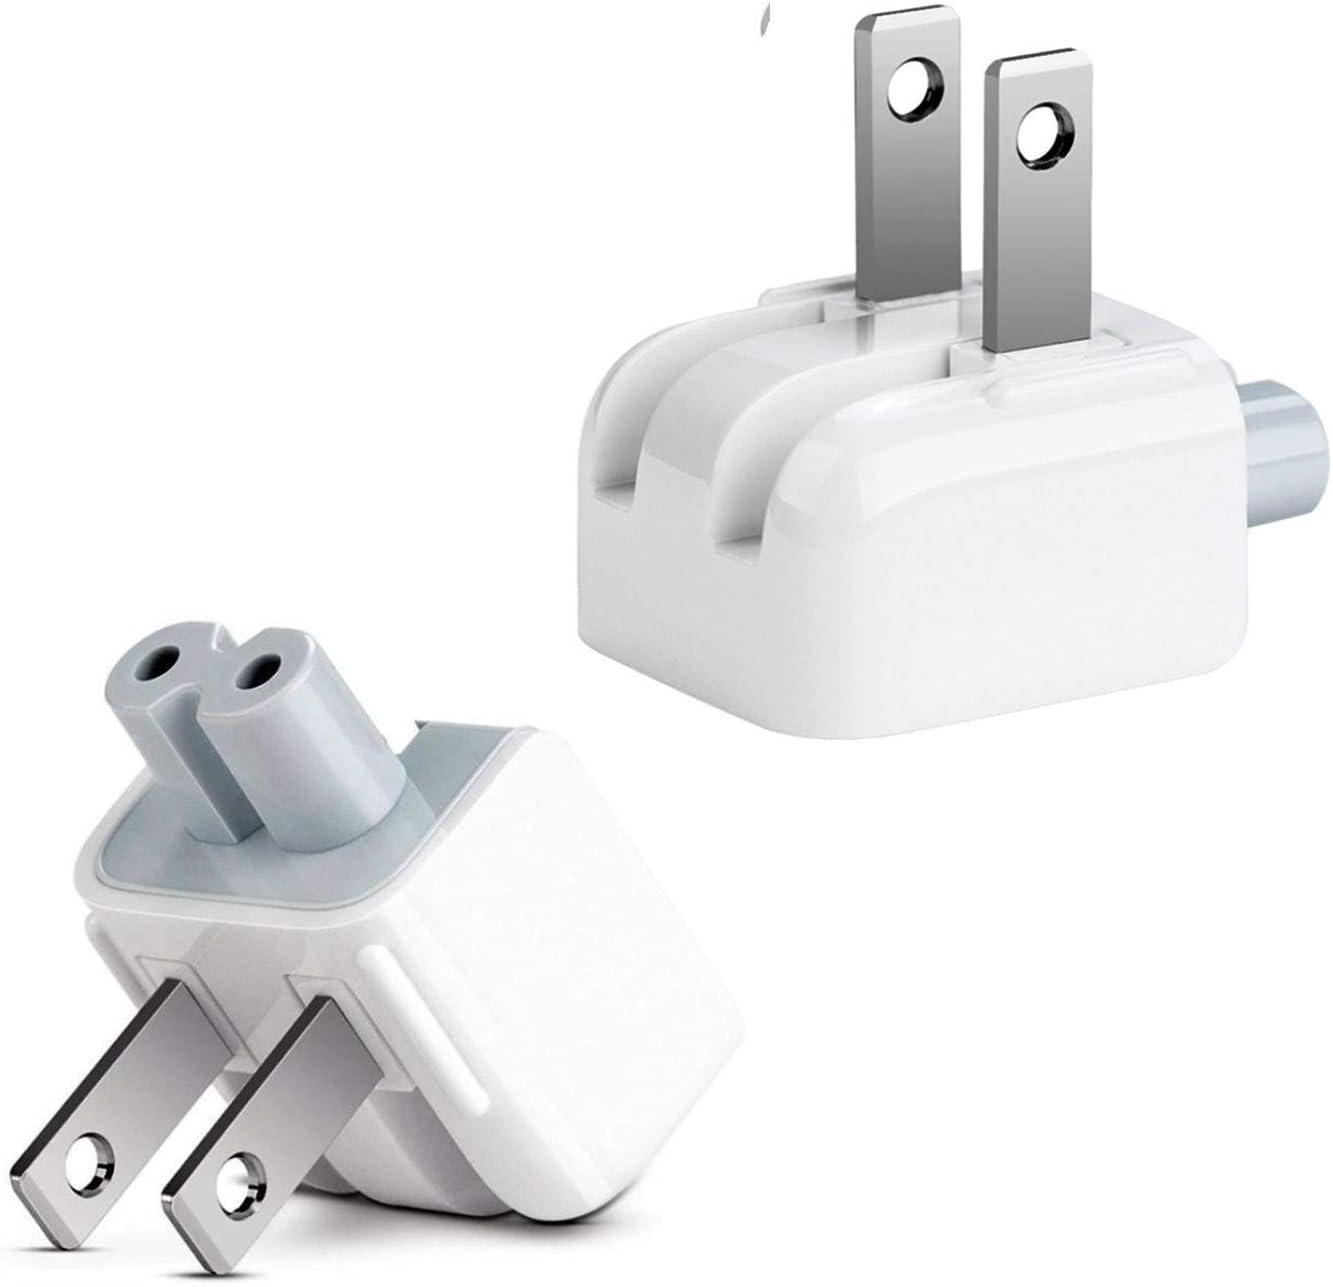 REYAER AC Wall Adapter Plug Duckhead US Wall Charger AC Cord US Standard Duck Head for McBook Maci Book/Phone/Pod AC Power Adapter (2 -Pack)